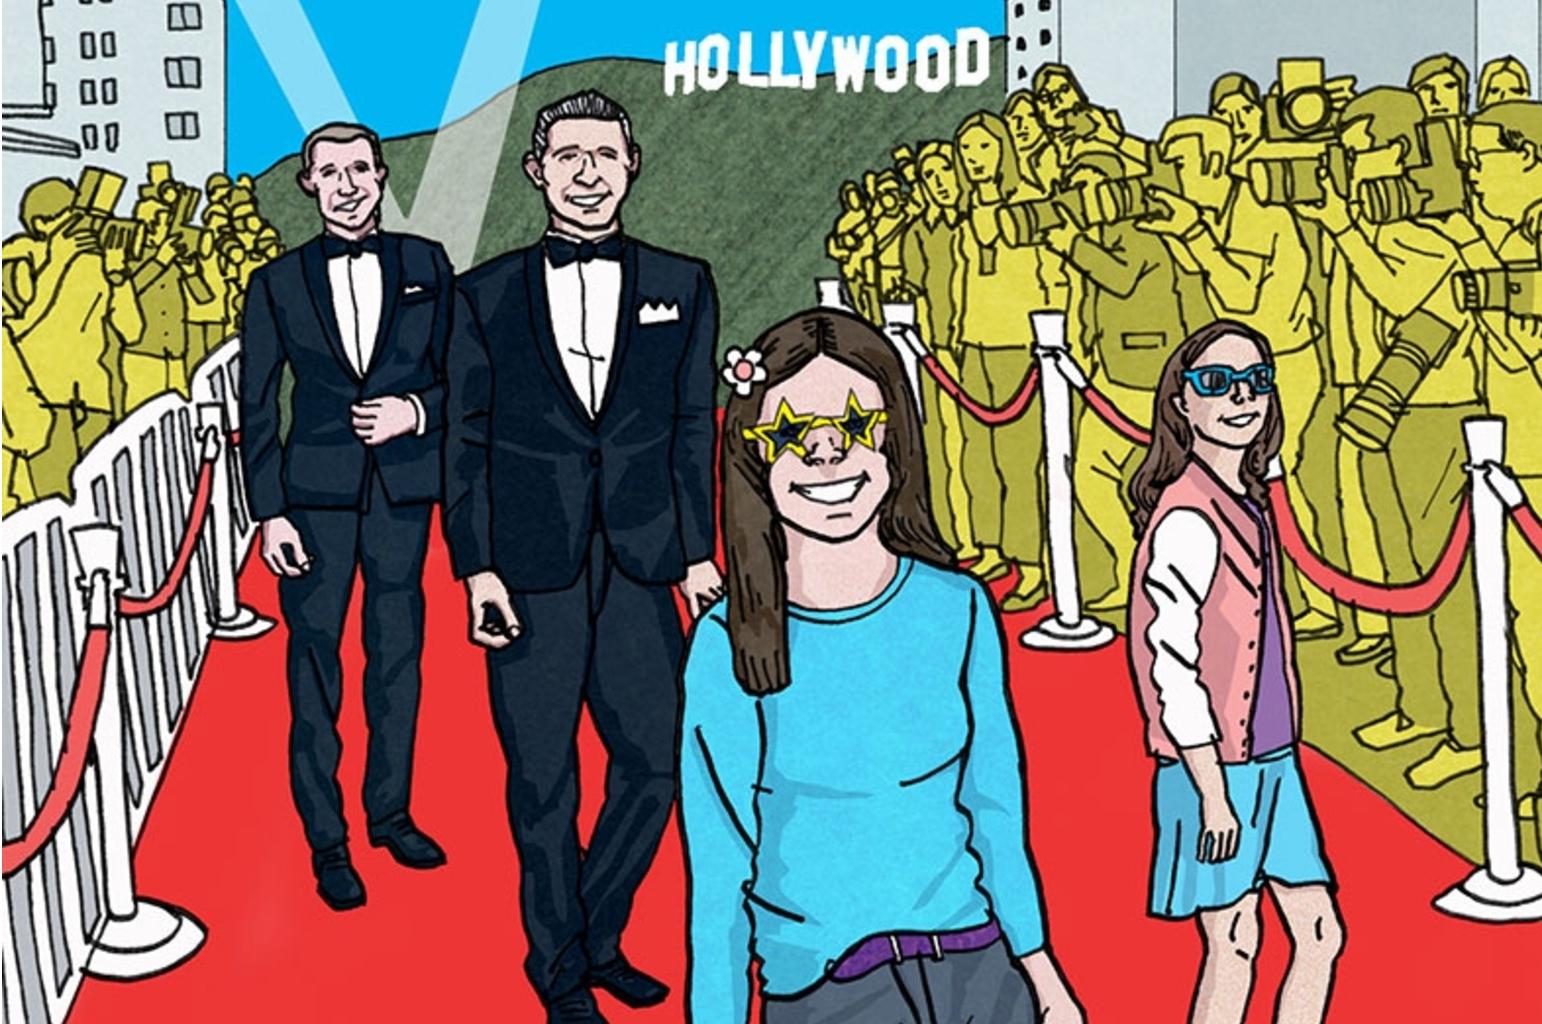 Hollywood-Glam